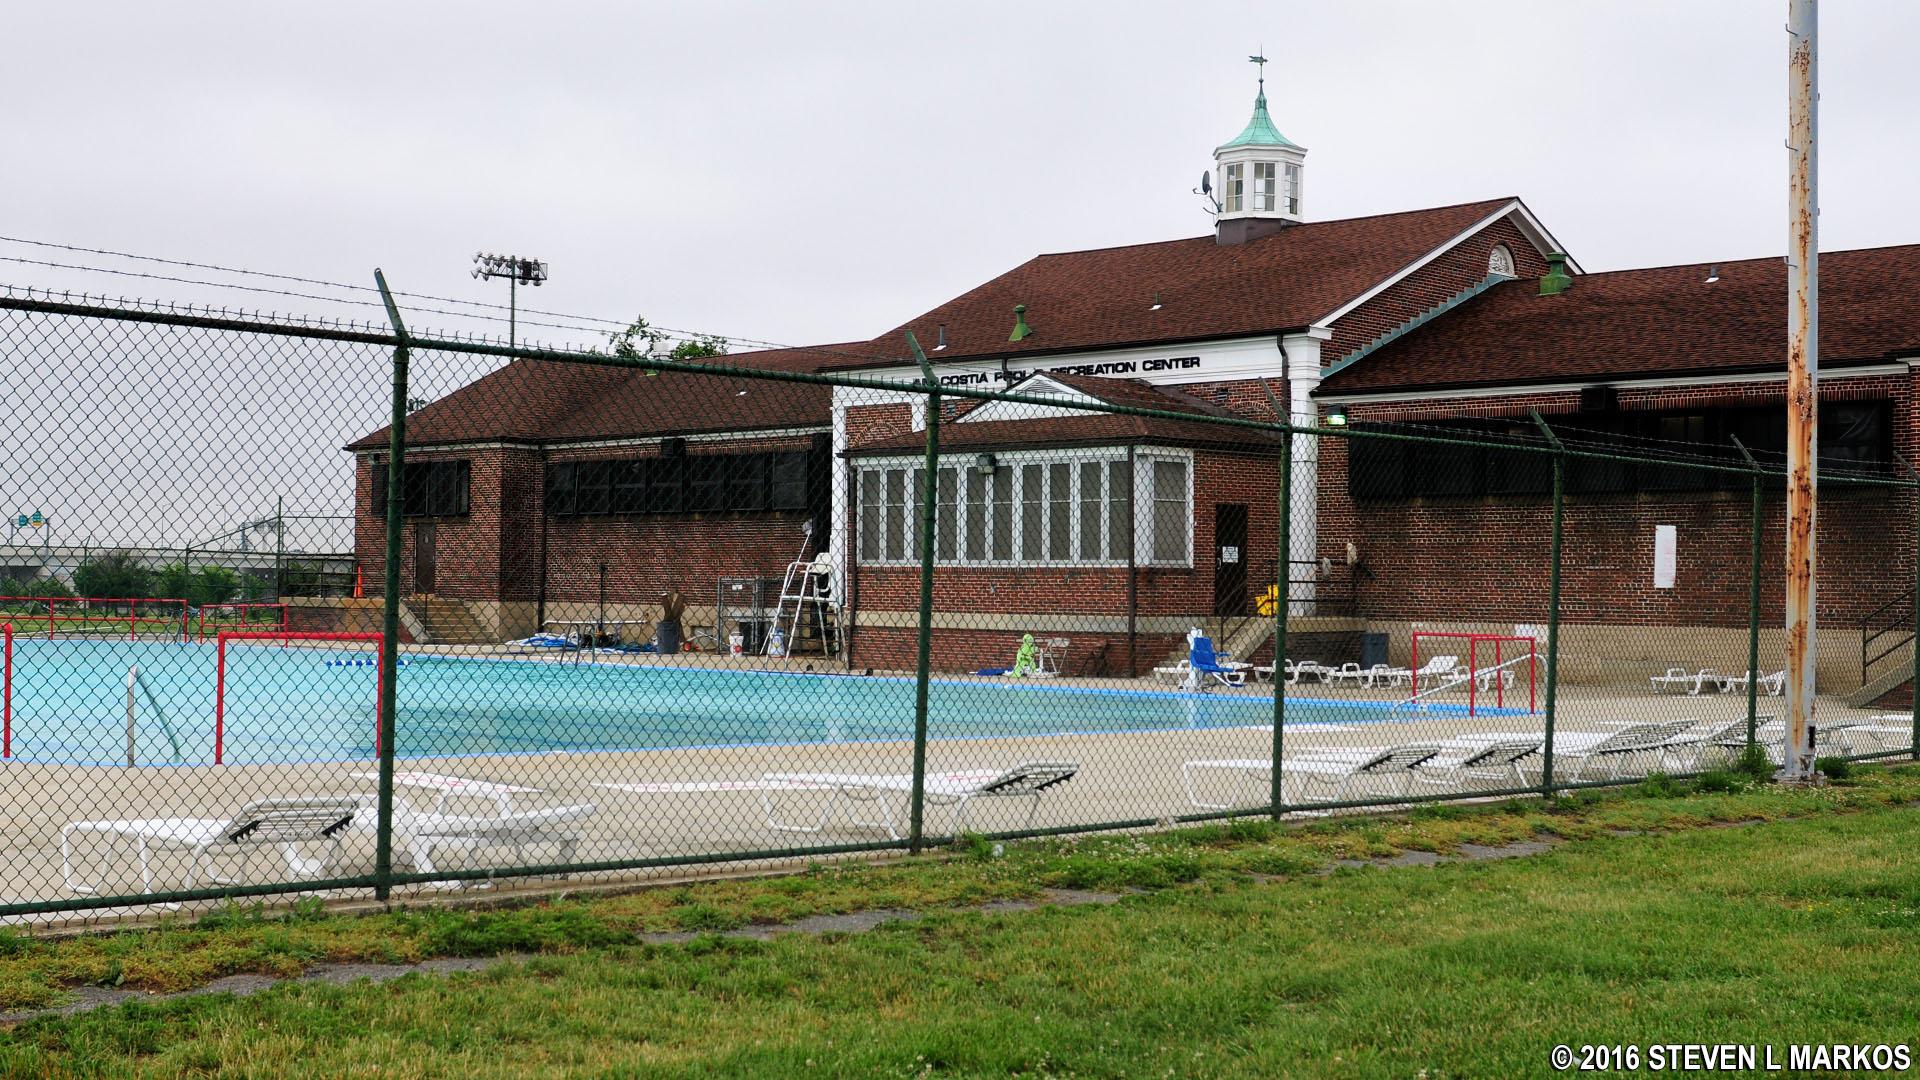 Anacostia Park Swimming Pool